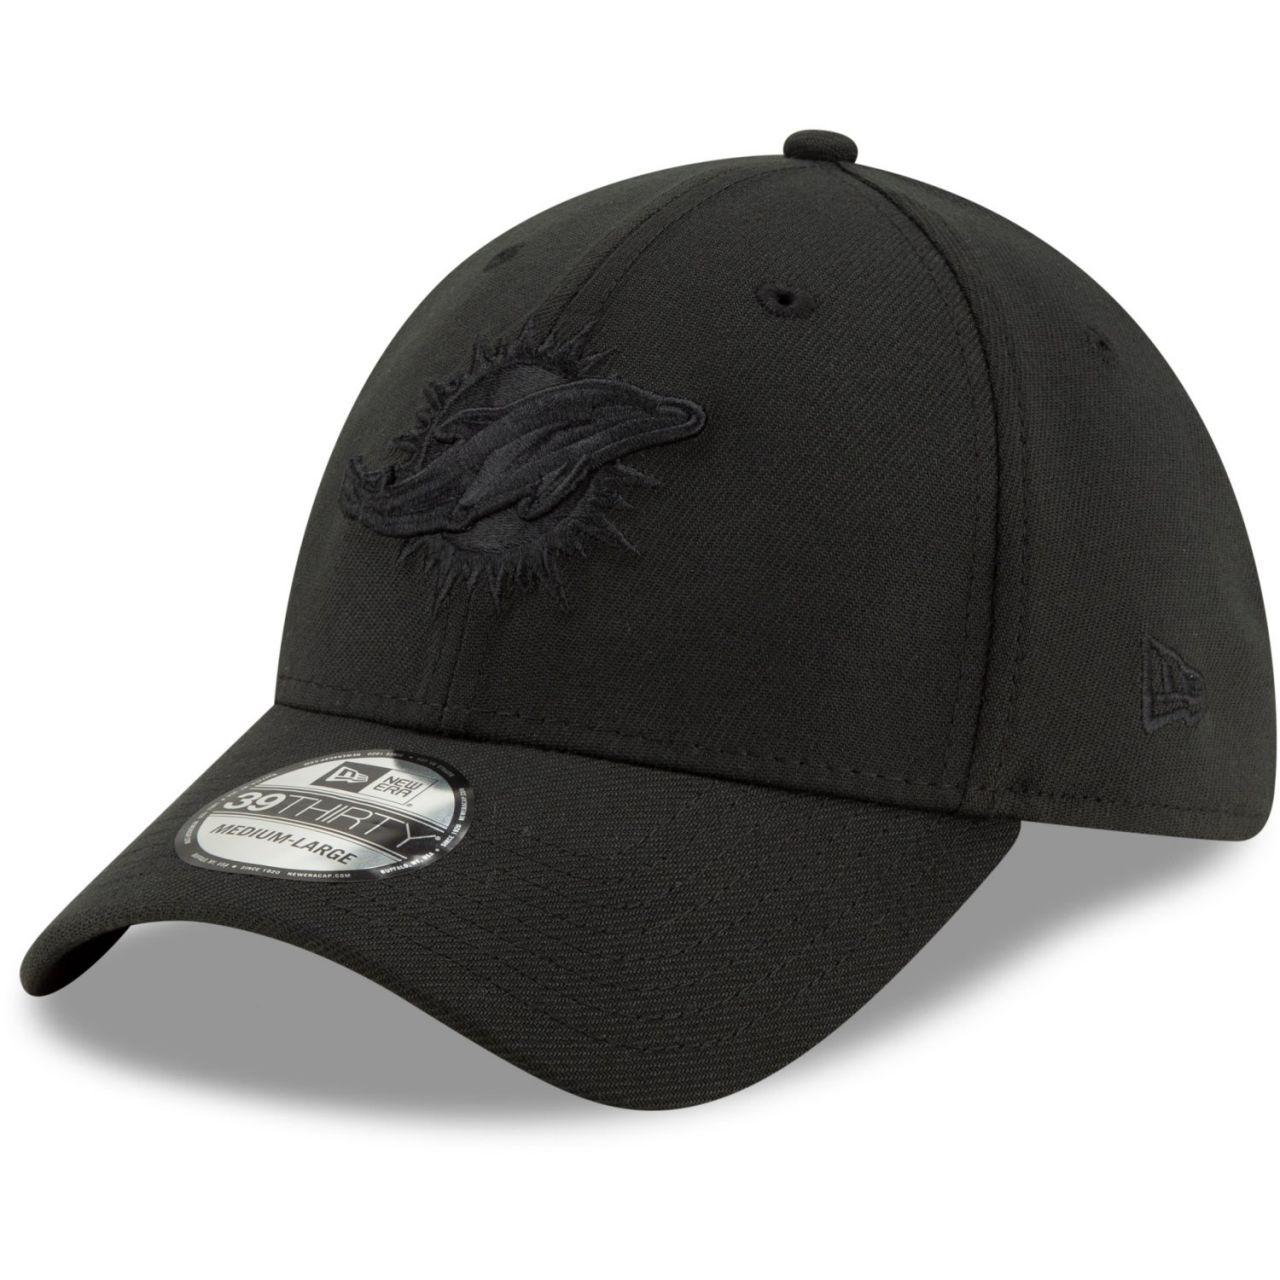 amfoo - New Era 39Thirty Stretch Cap - NFL Miami Dolphins